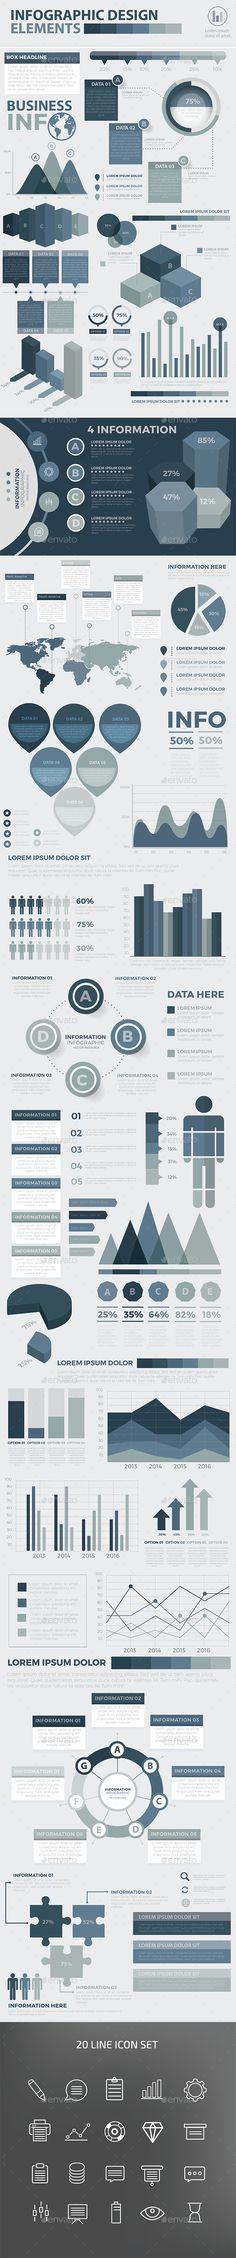 Modern Infographic Elements Design Template Vector EPS, AI Illustrator. Download here: http://graphicriver.net/item/modern-infographic-elements-design/16480725?ref=ksioks